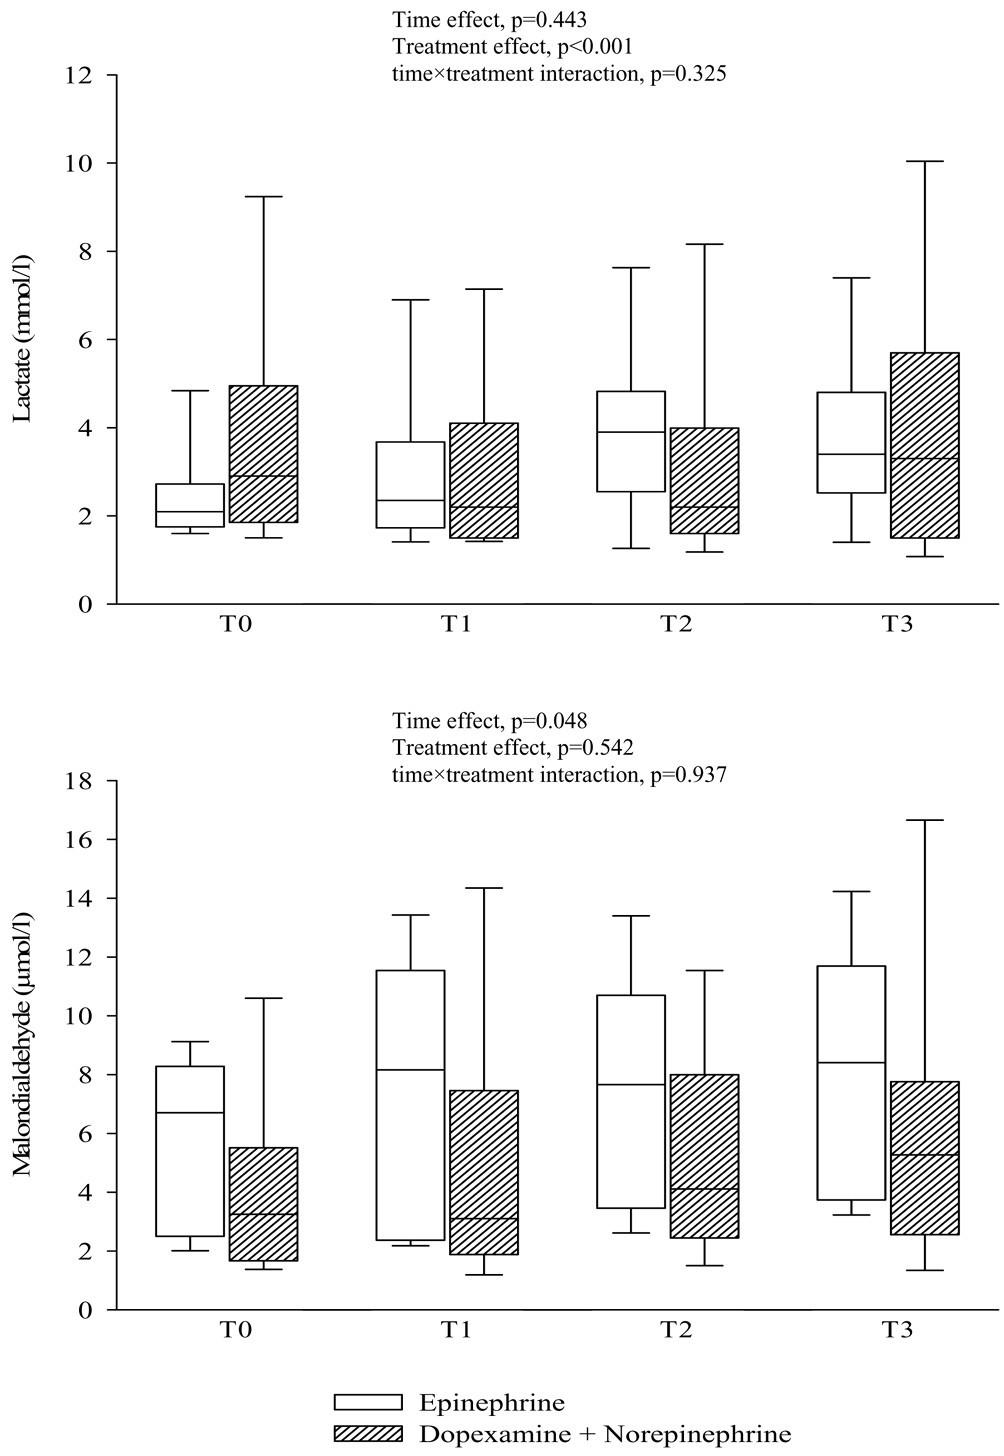 Dopexamine And Norepinephrine Versus Epinephrine On Gastric Jacinto 6 Block Diagram Figure 3